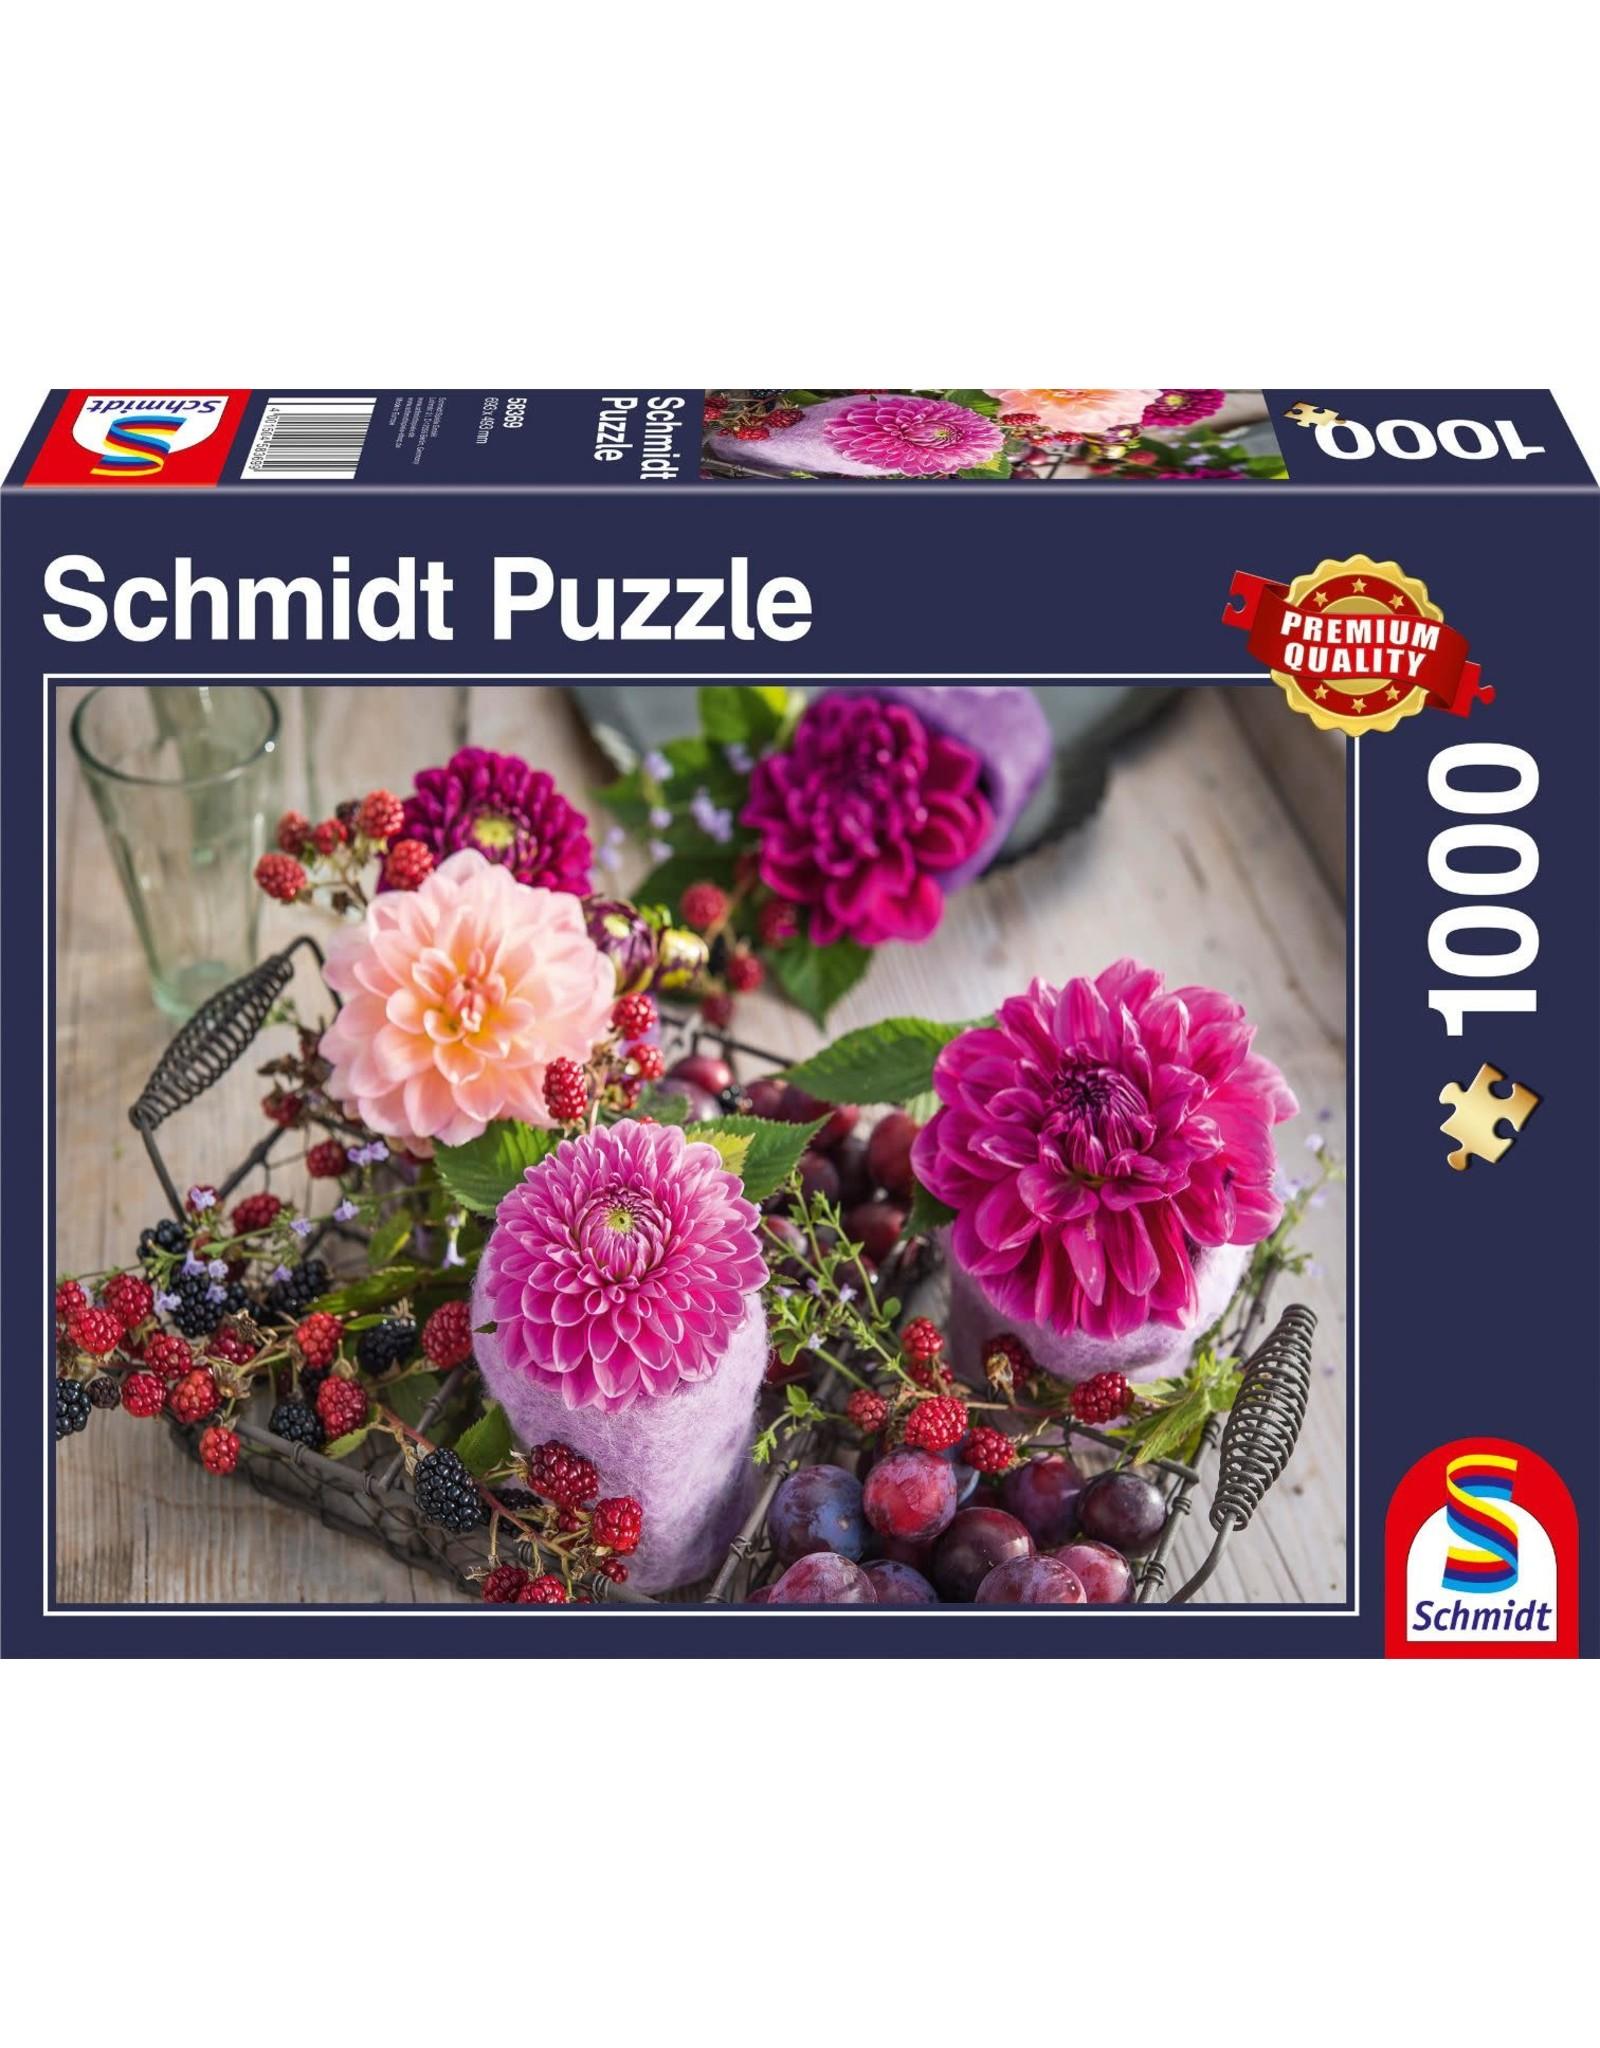 Schmidt Berries & Flowers 1000pc Puzzle